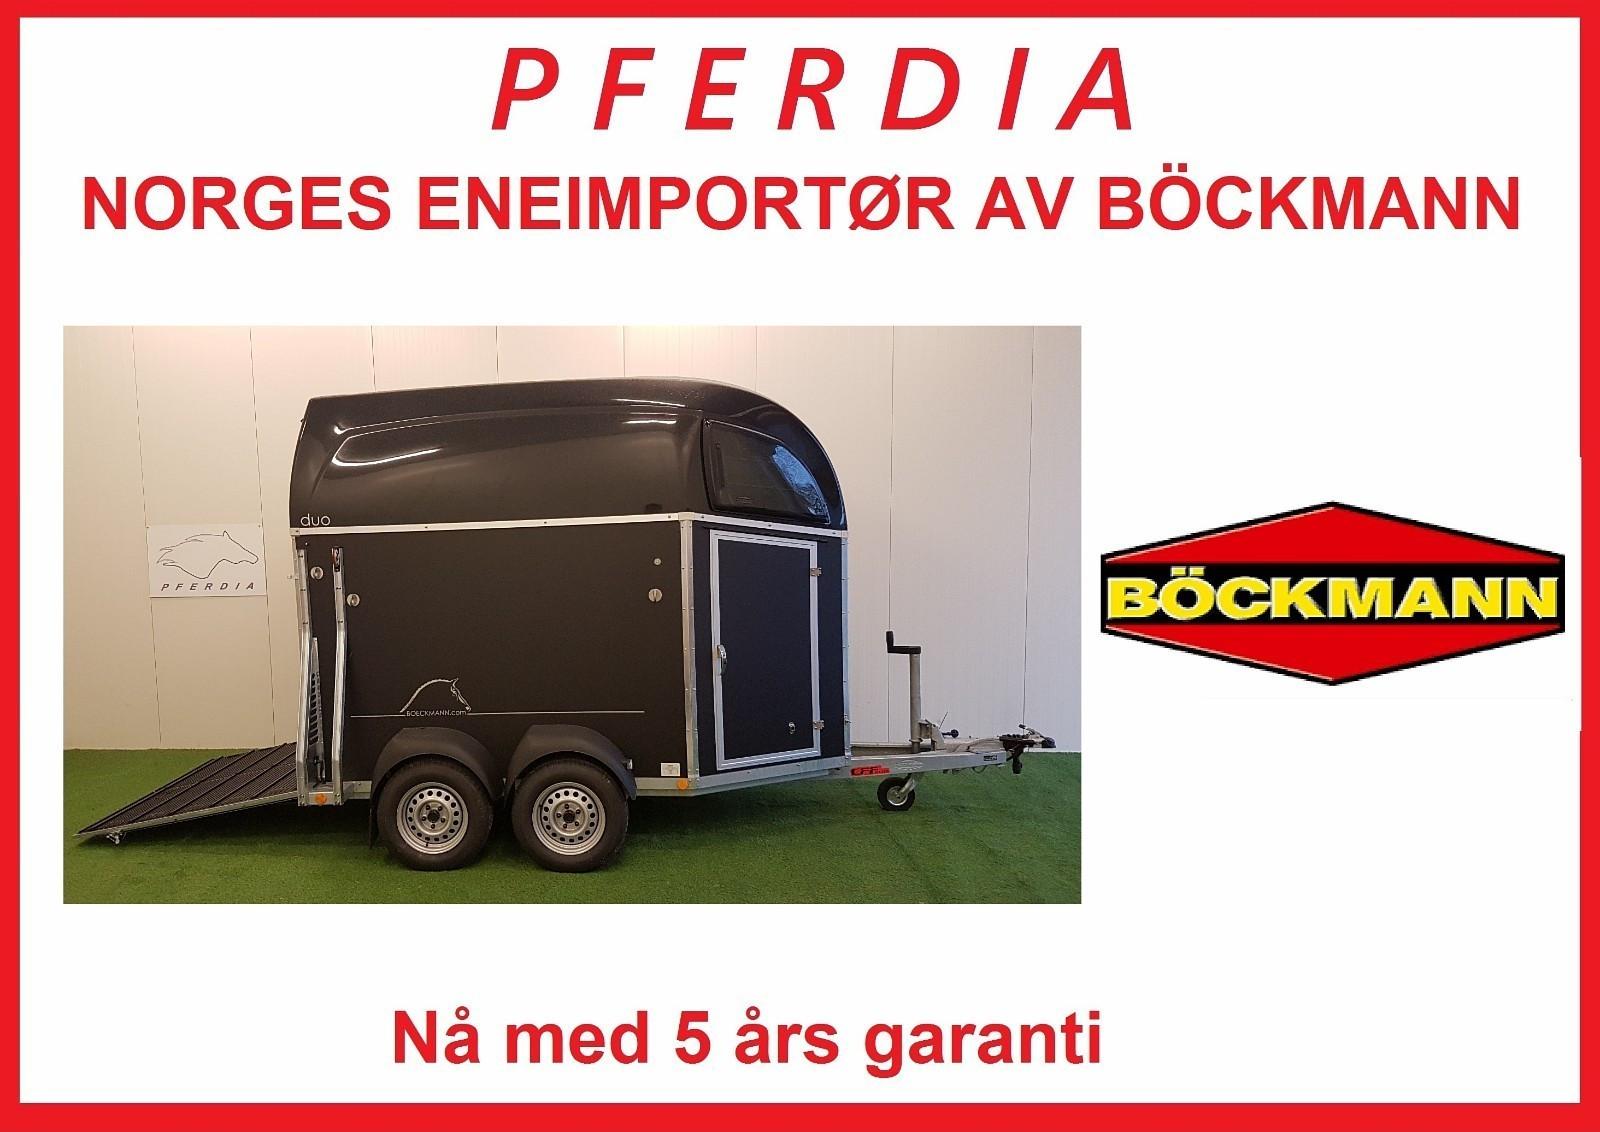 e213ba9d SUPERTILBUD! KUN 1 STK! BÖCKMANN DUO C. Avdeling Drammen! . | FINN.no